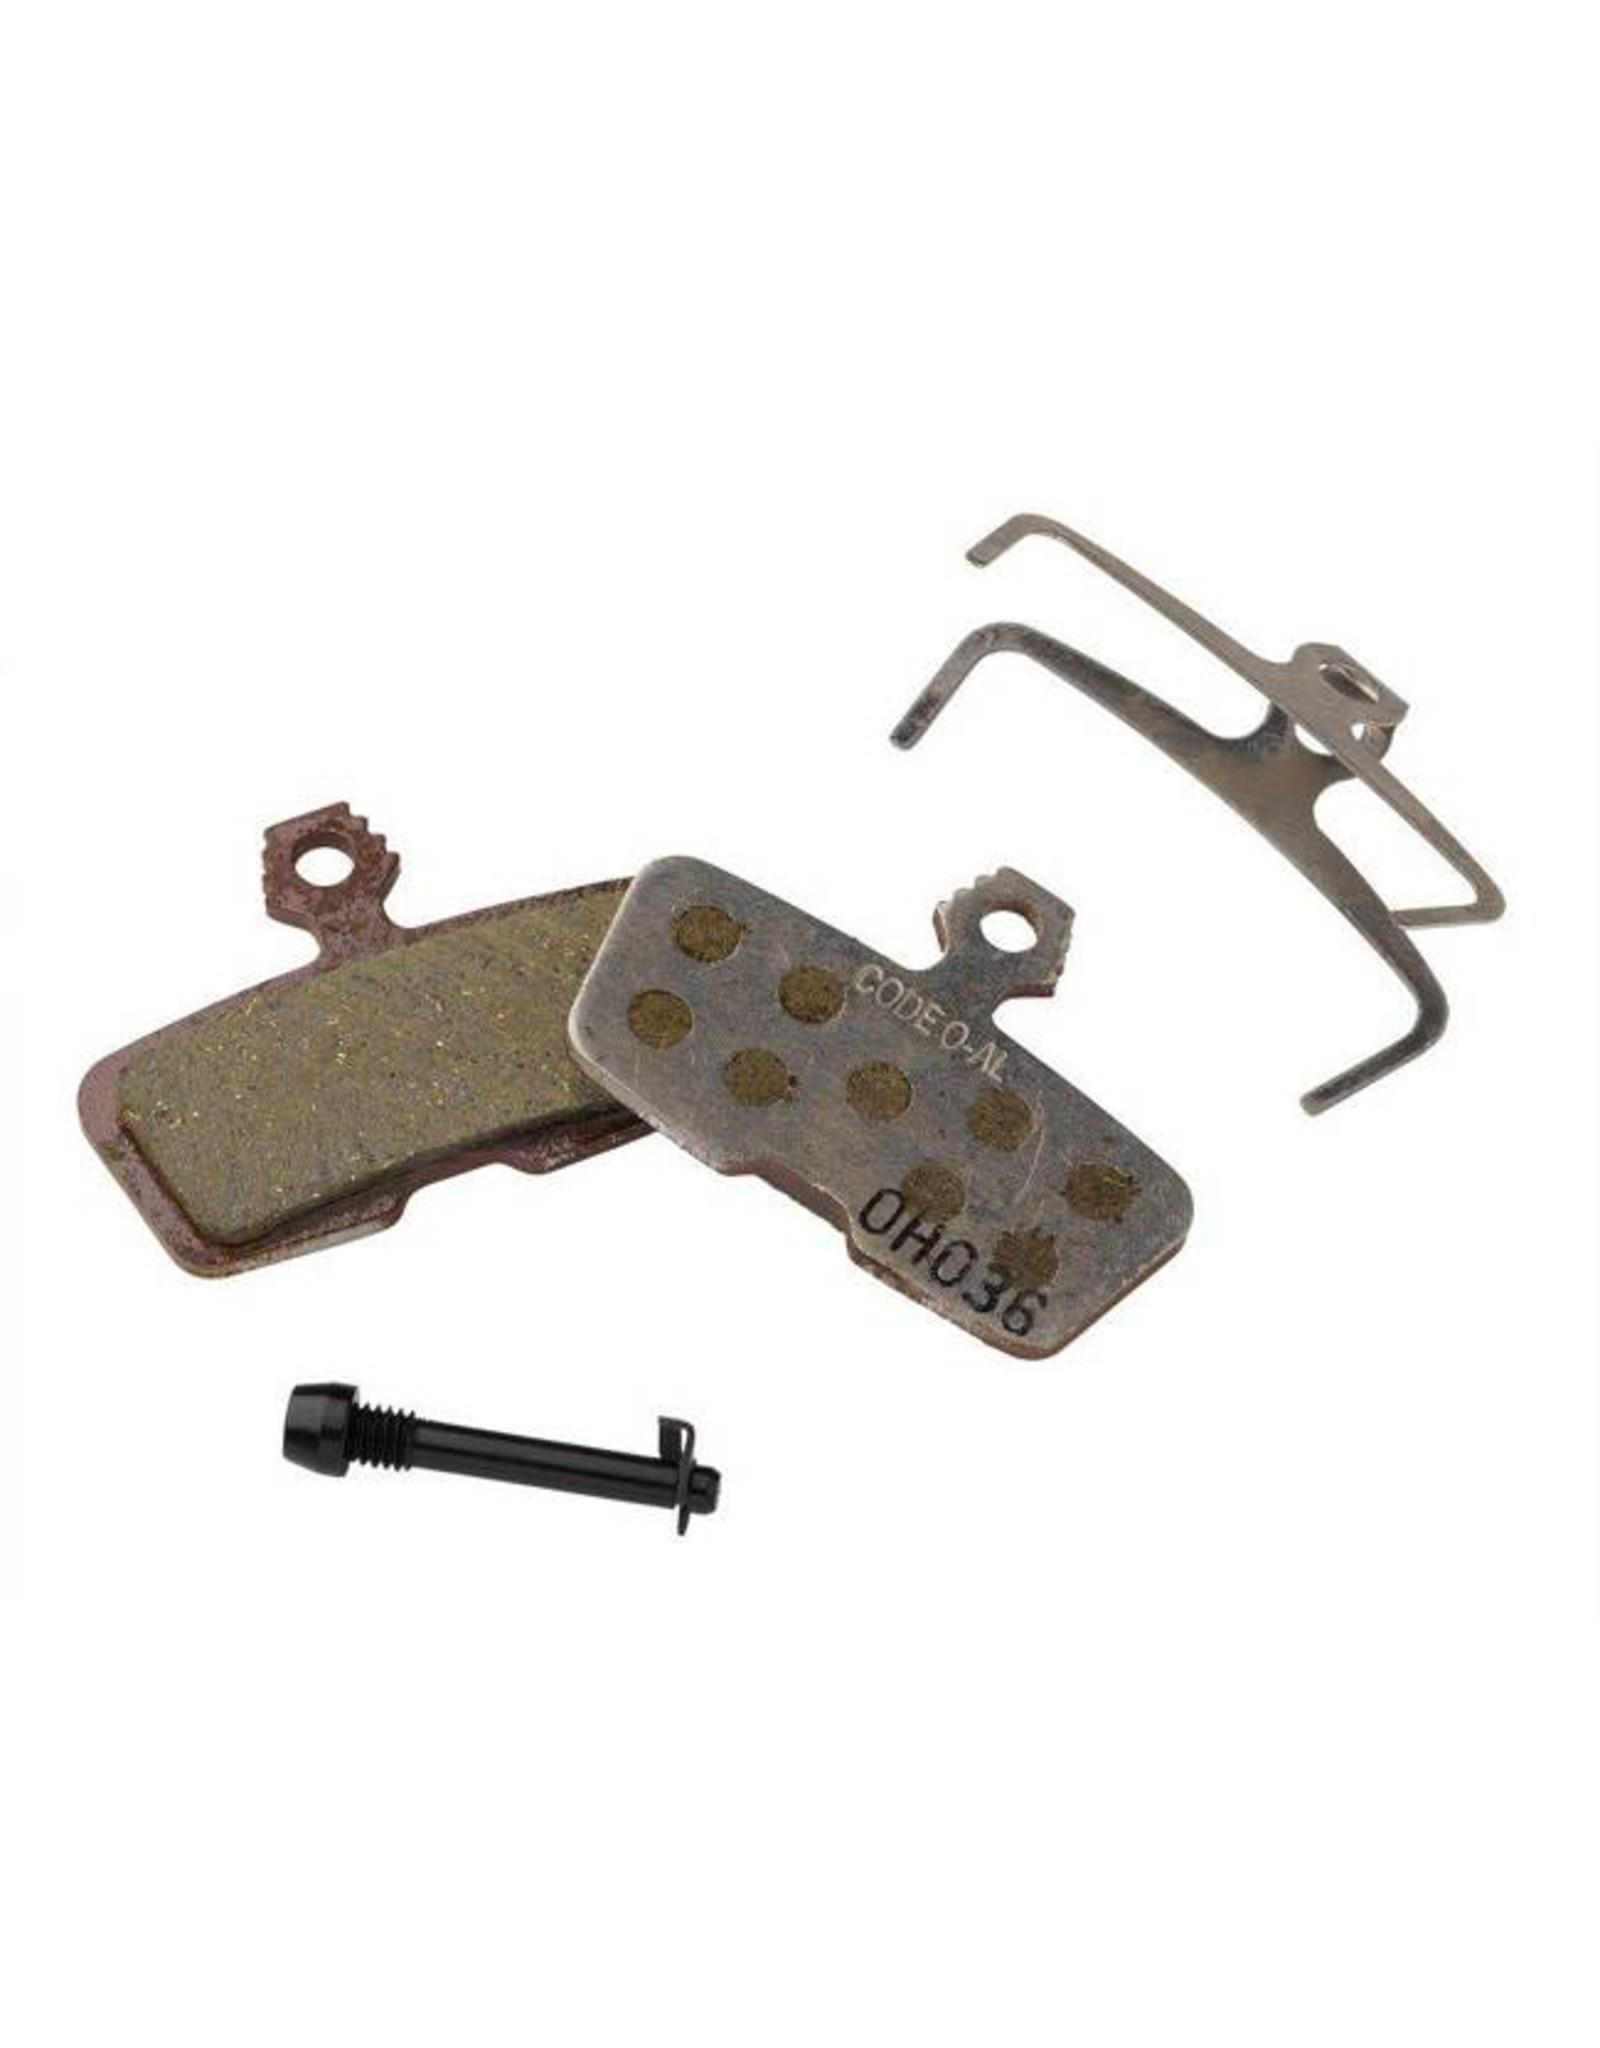 SRAM SRAM/Avid Code, Code RSC, Code R, Guide RE Organic Disc Brake Pad, Aluminum Back, Pair